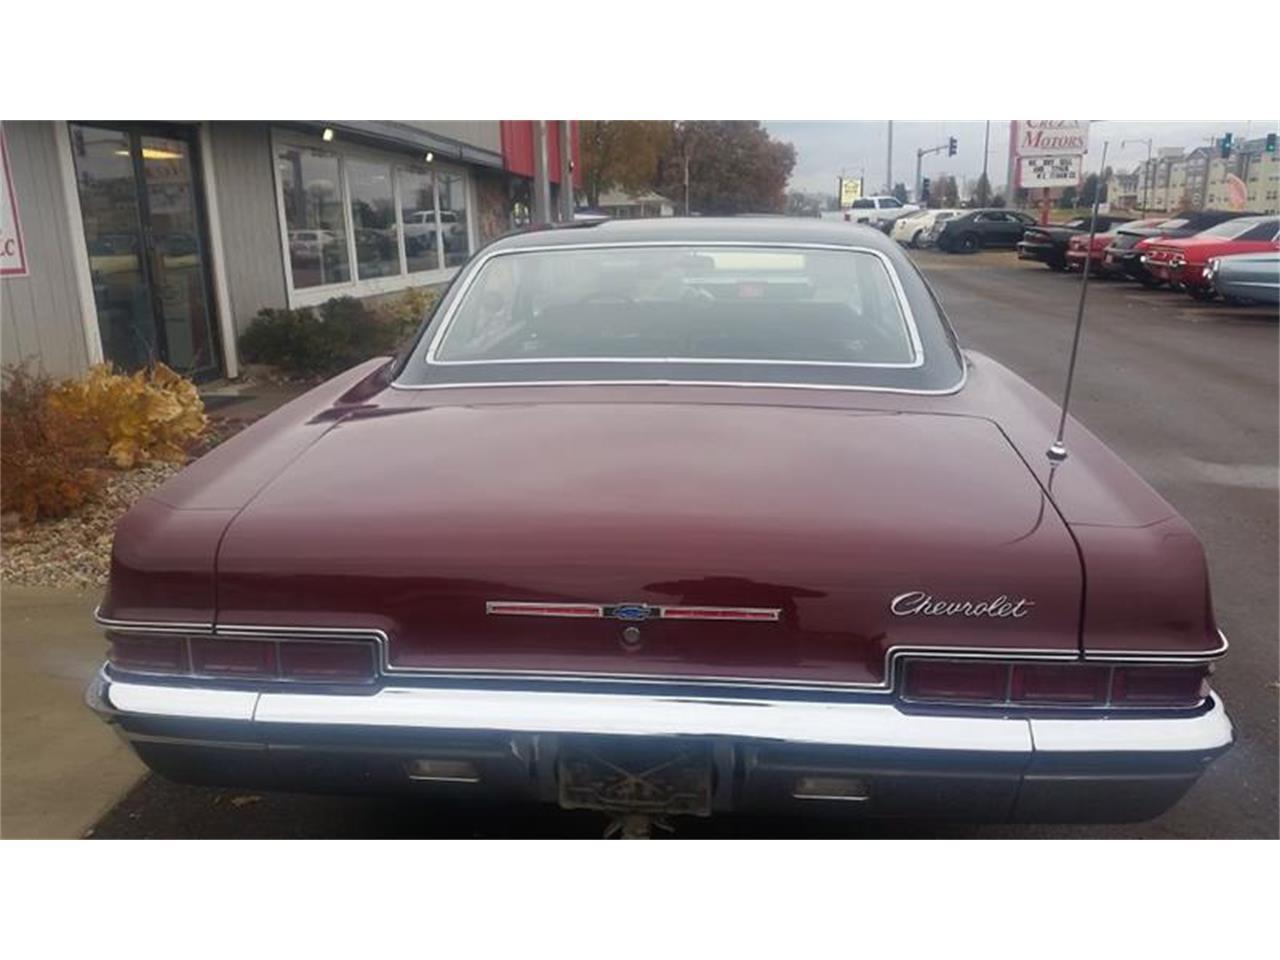 1966 Chevrolet Impala (CC-1183376) for sale in Spirit Lake, Iowa